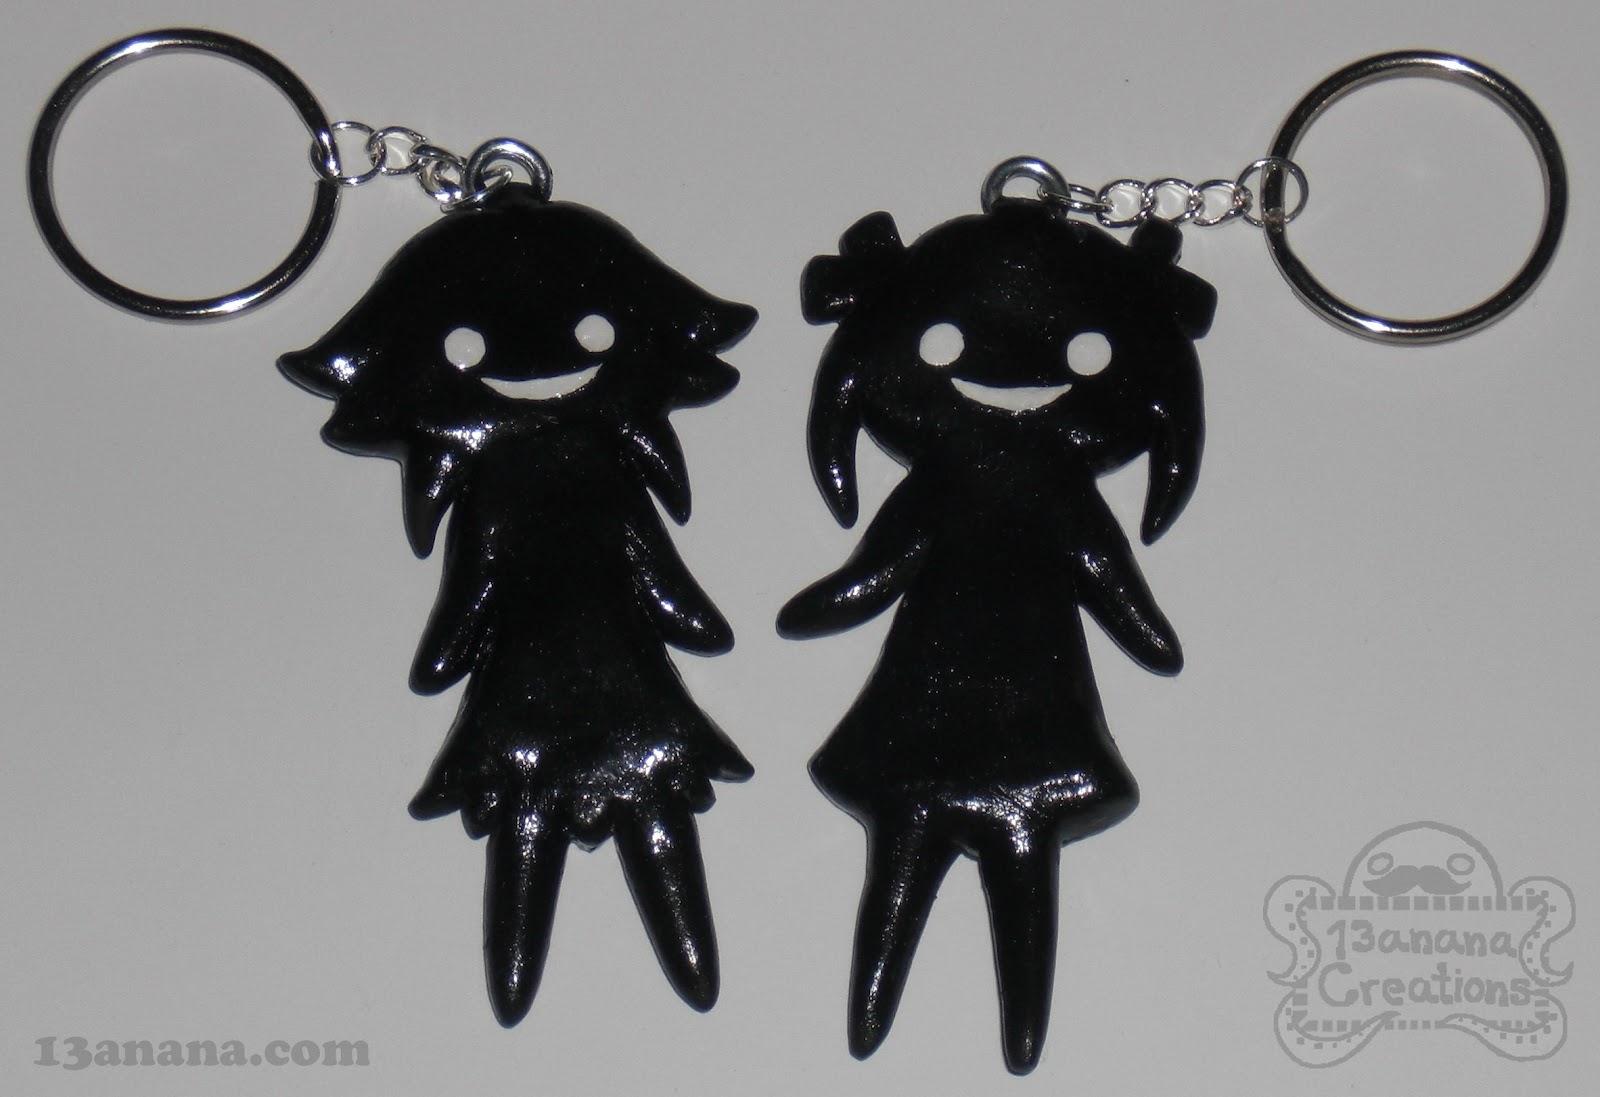 0a783e23574773 13anana Creations: More Soul Eater Shadow Crona's!